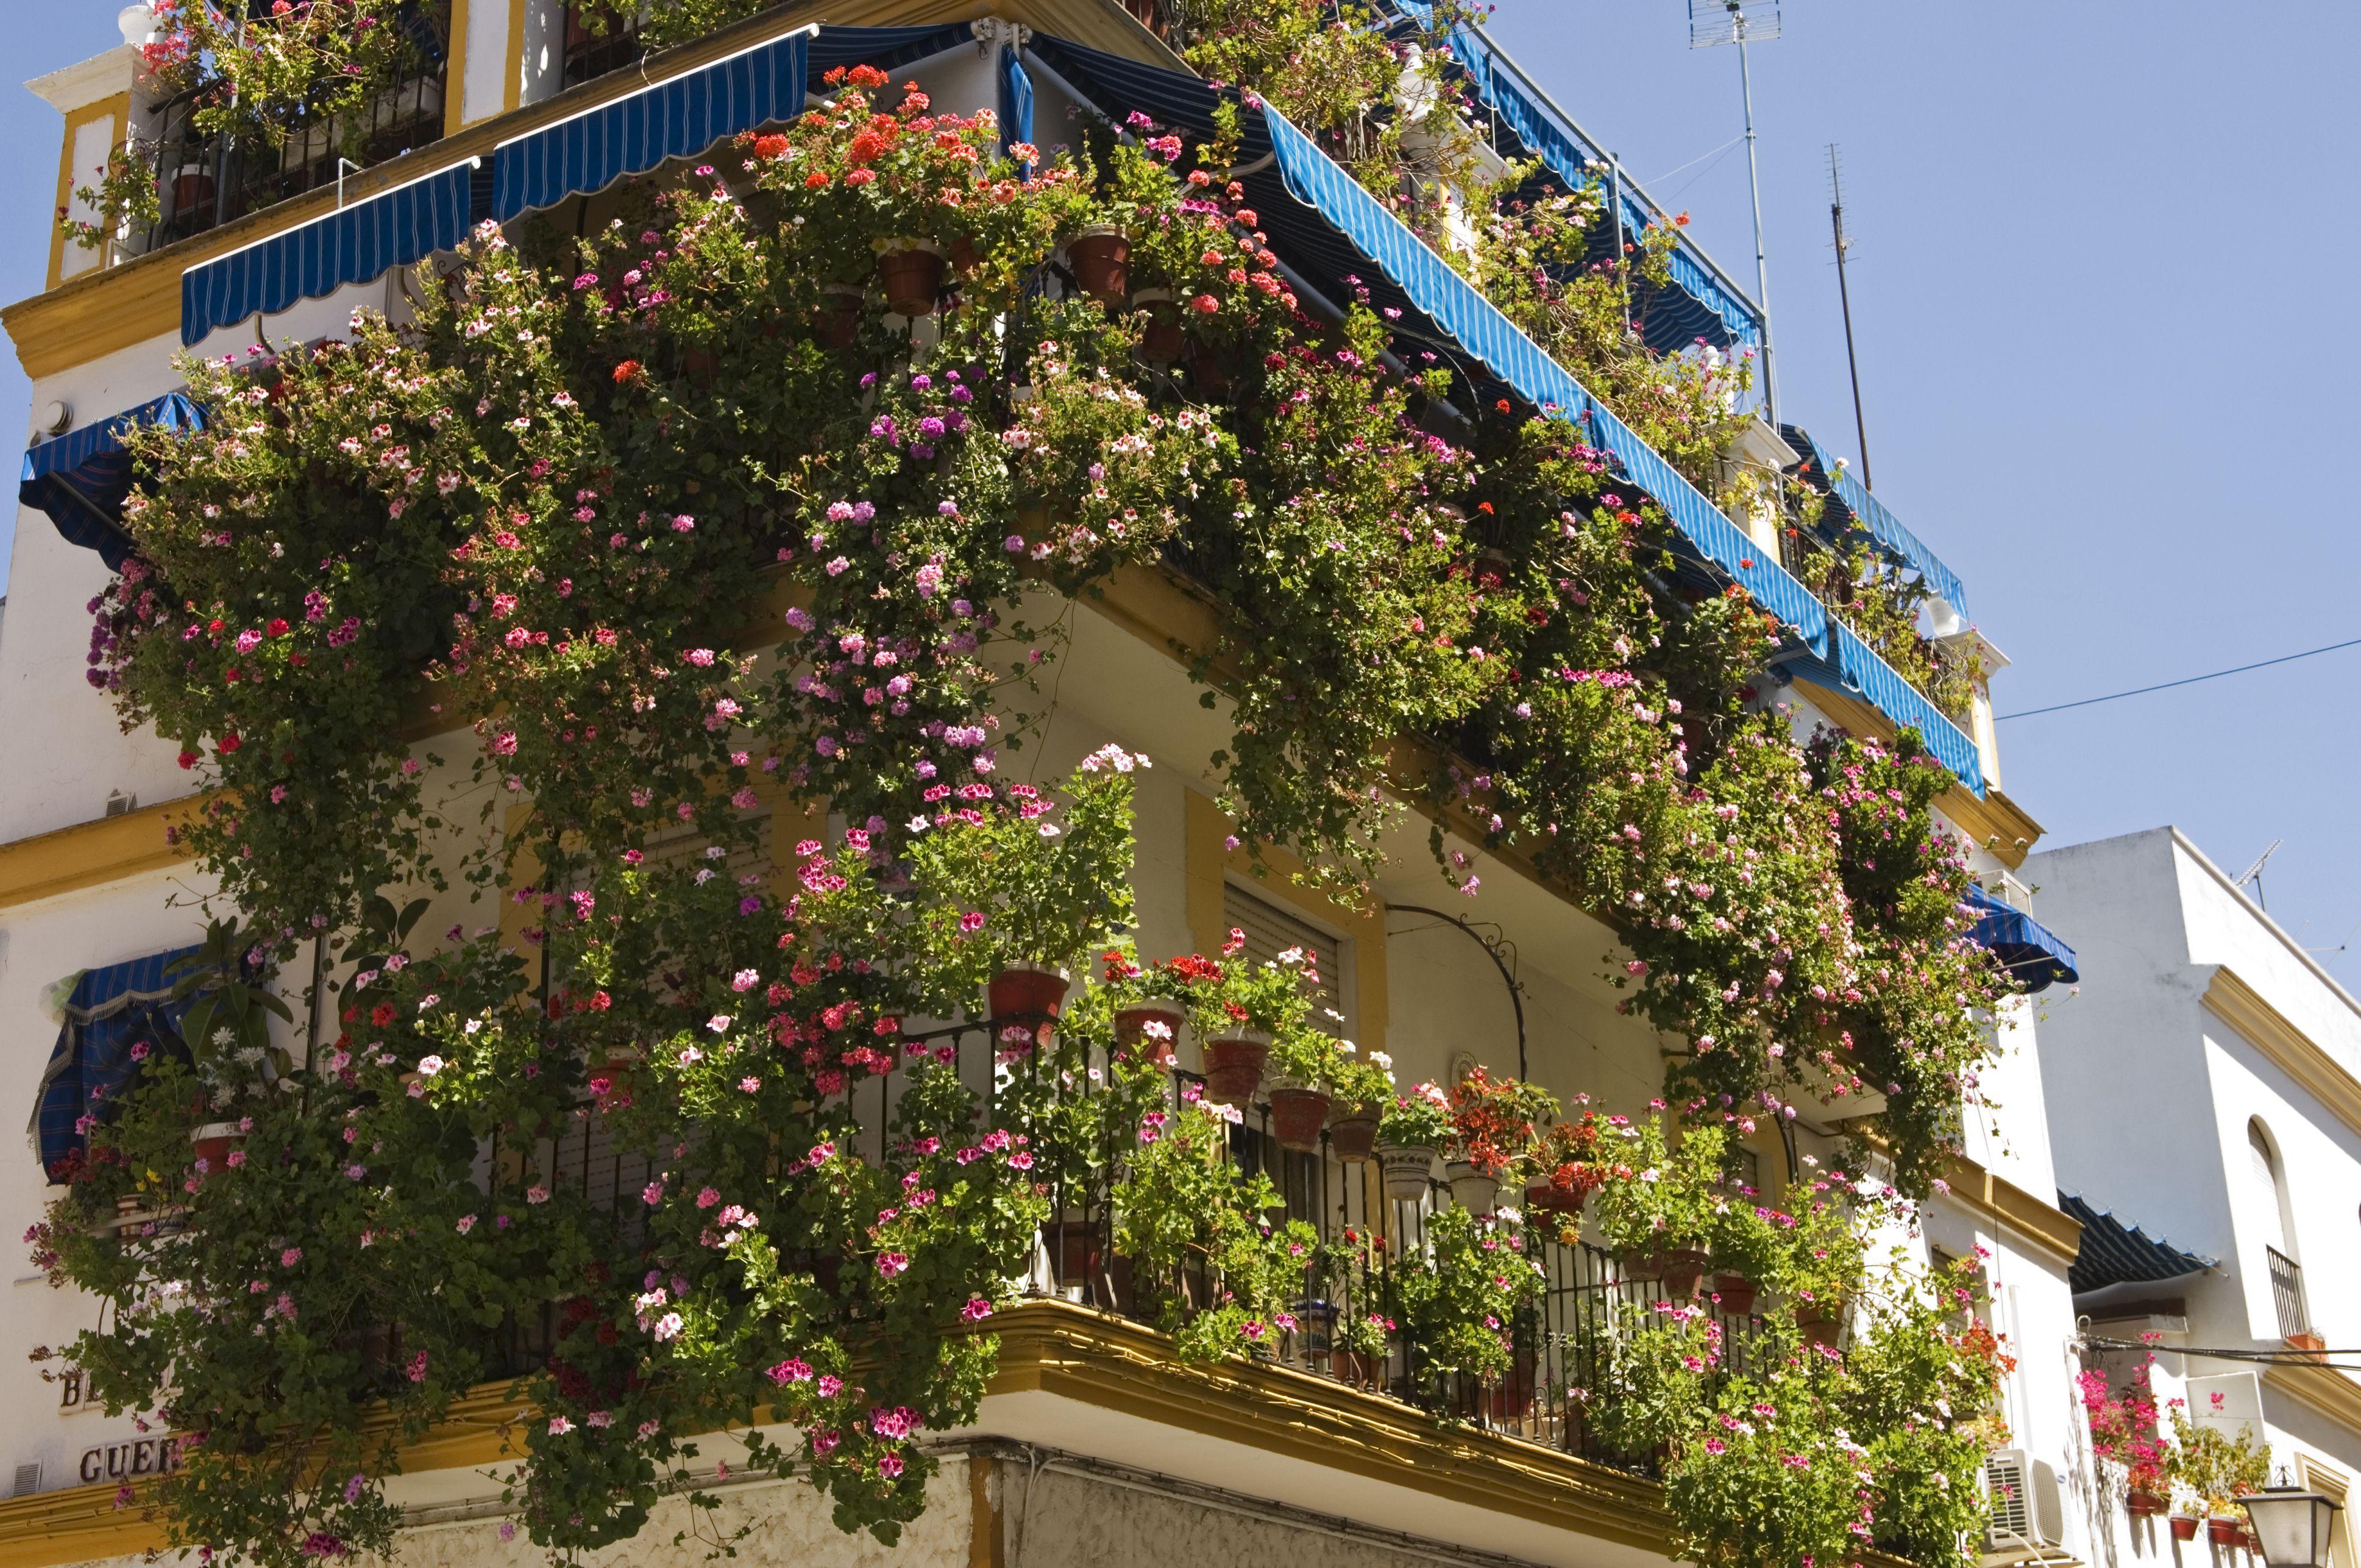 Beautiful Flower Gardens For Small Spaces In 2020 Gardening For Beginners Balcony Garden Urban Garden